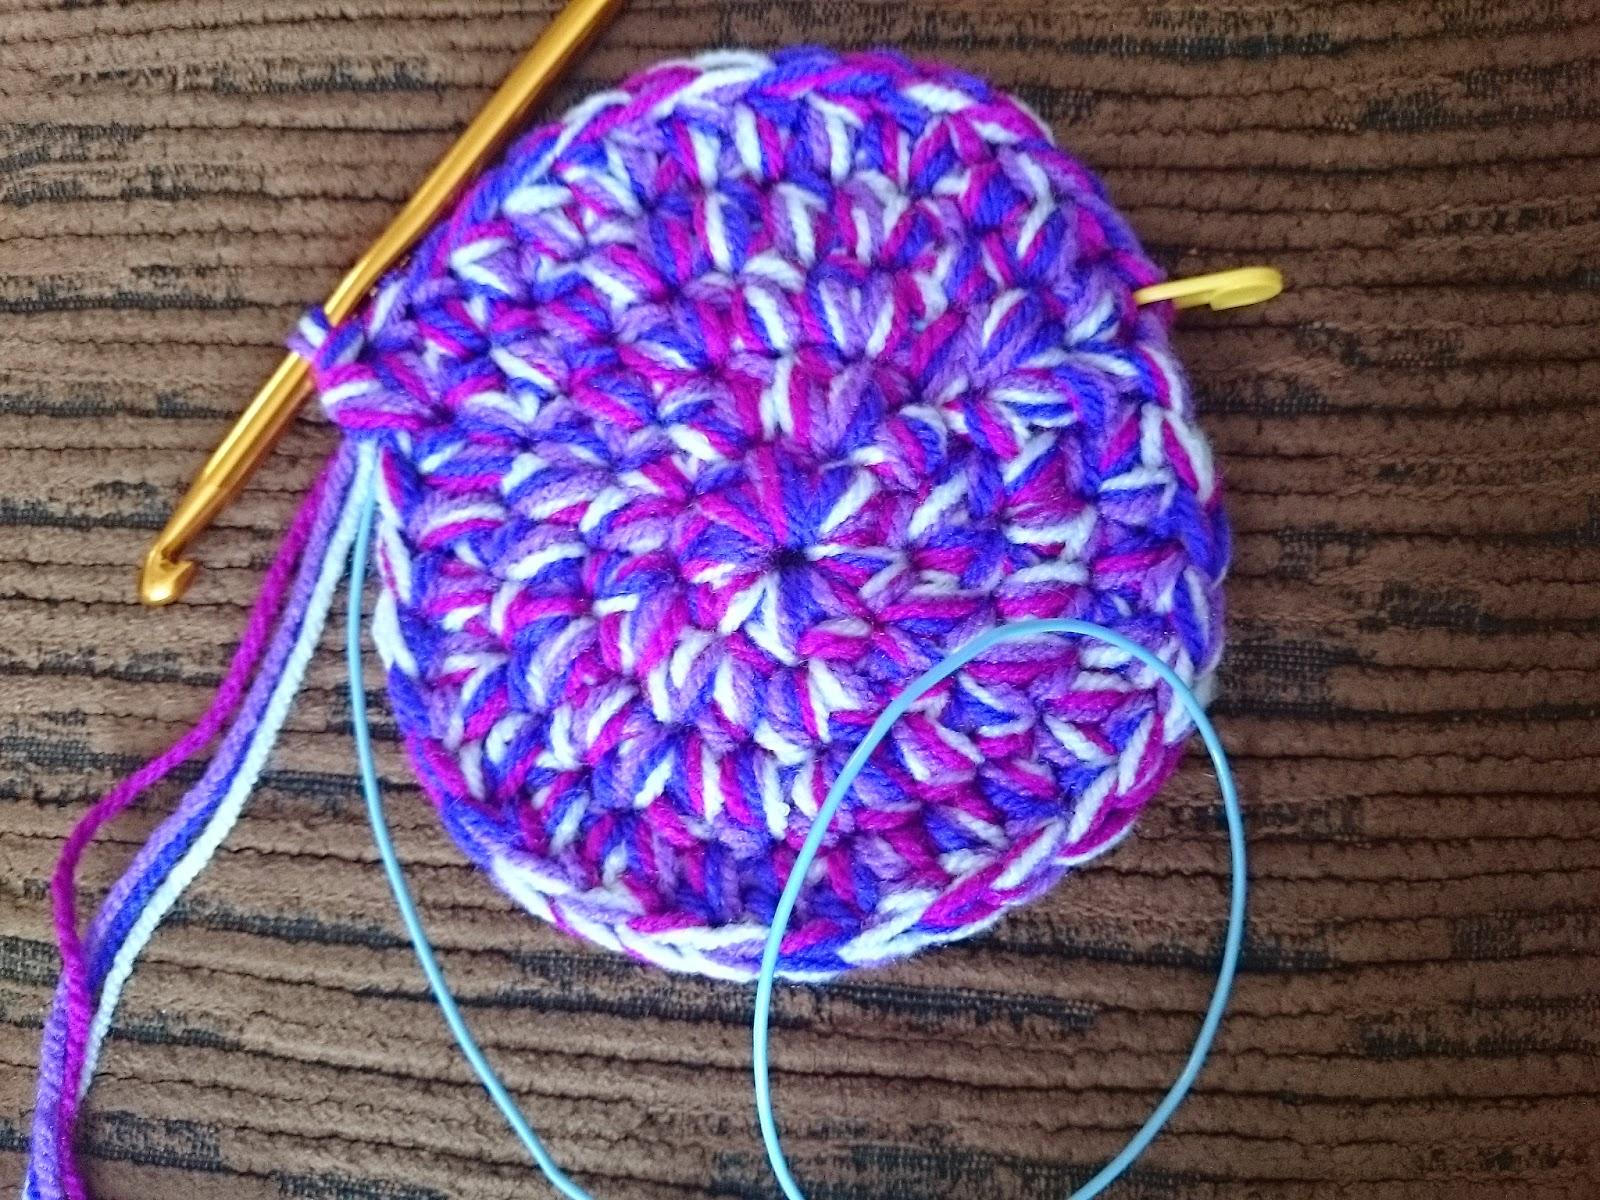 crochet basket with handles purple four strands yarn 8mm hook stitch marker